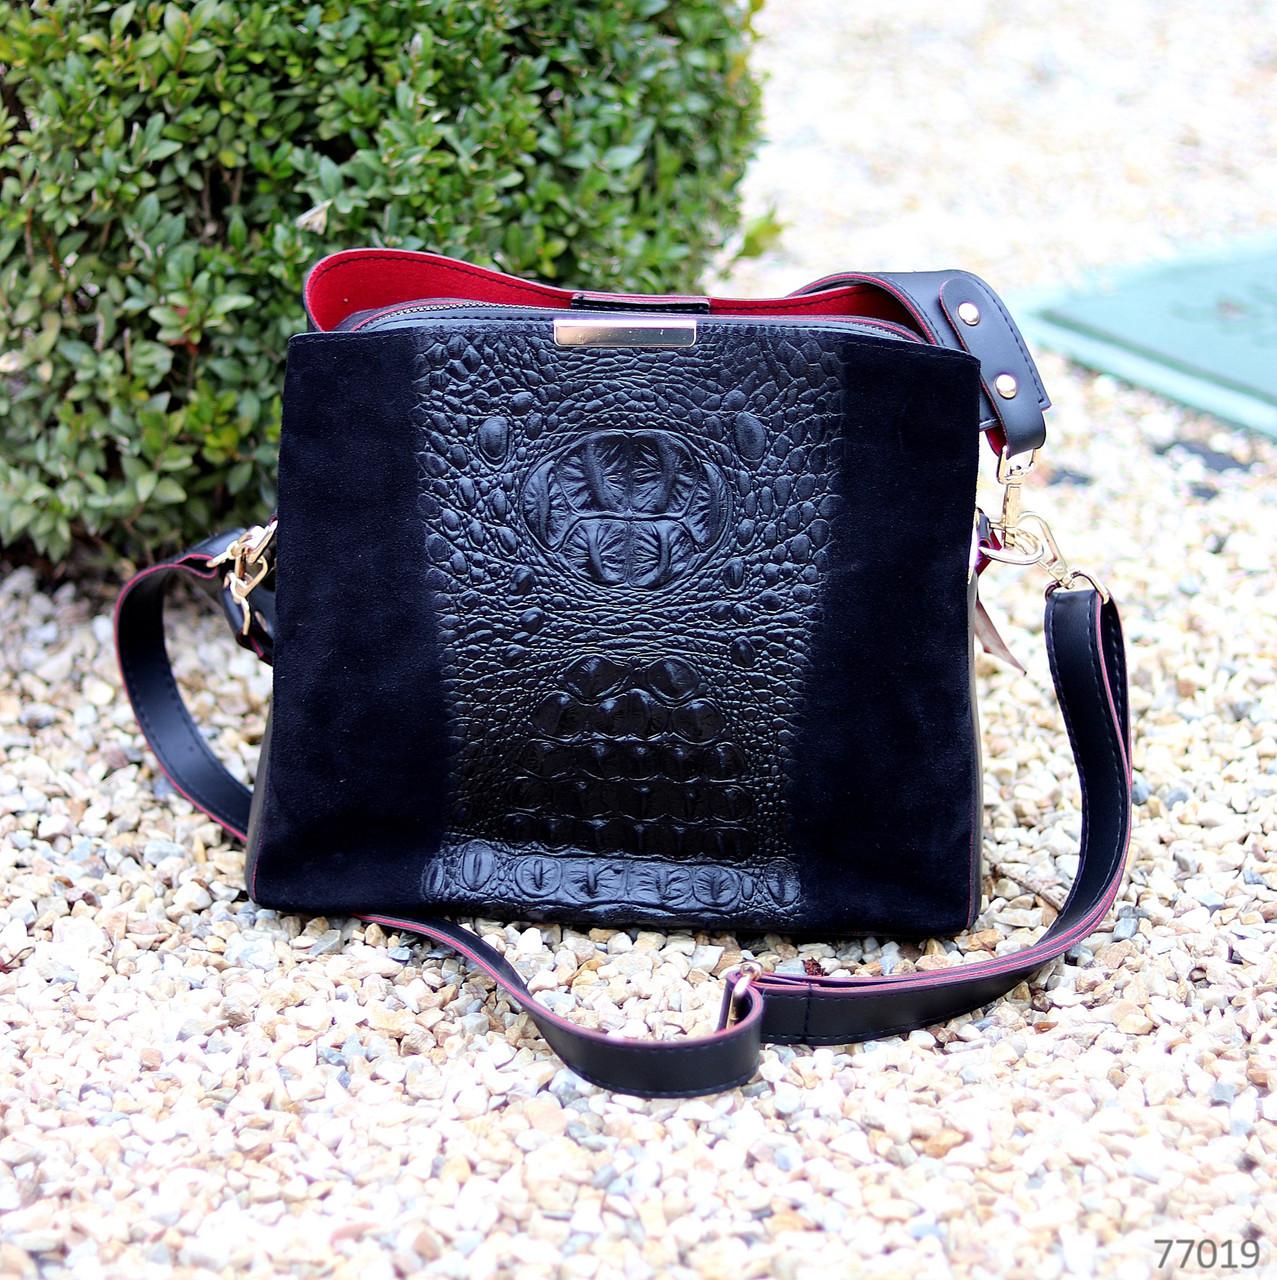 Крутая черная фактурная замшевая женская сумка натуральная замша с длинными ручками